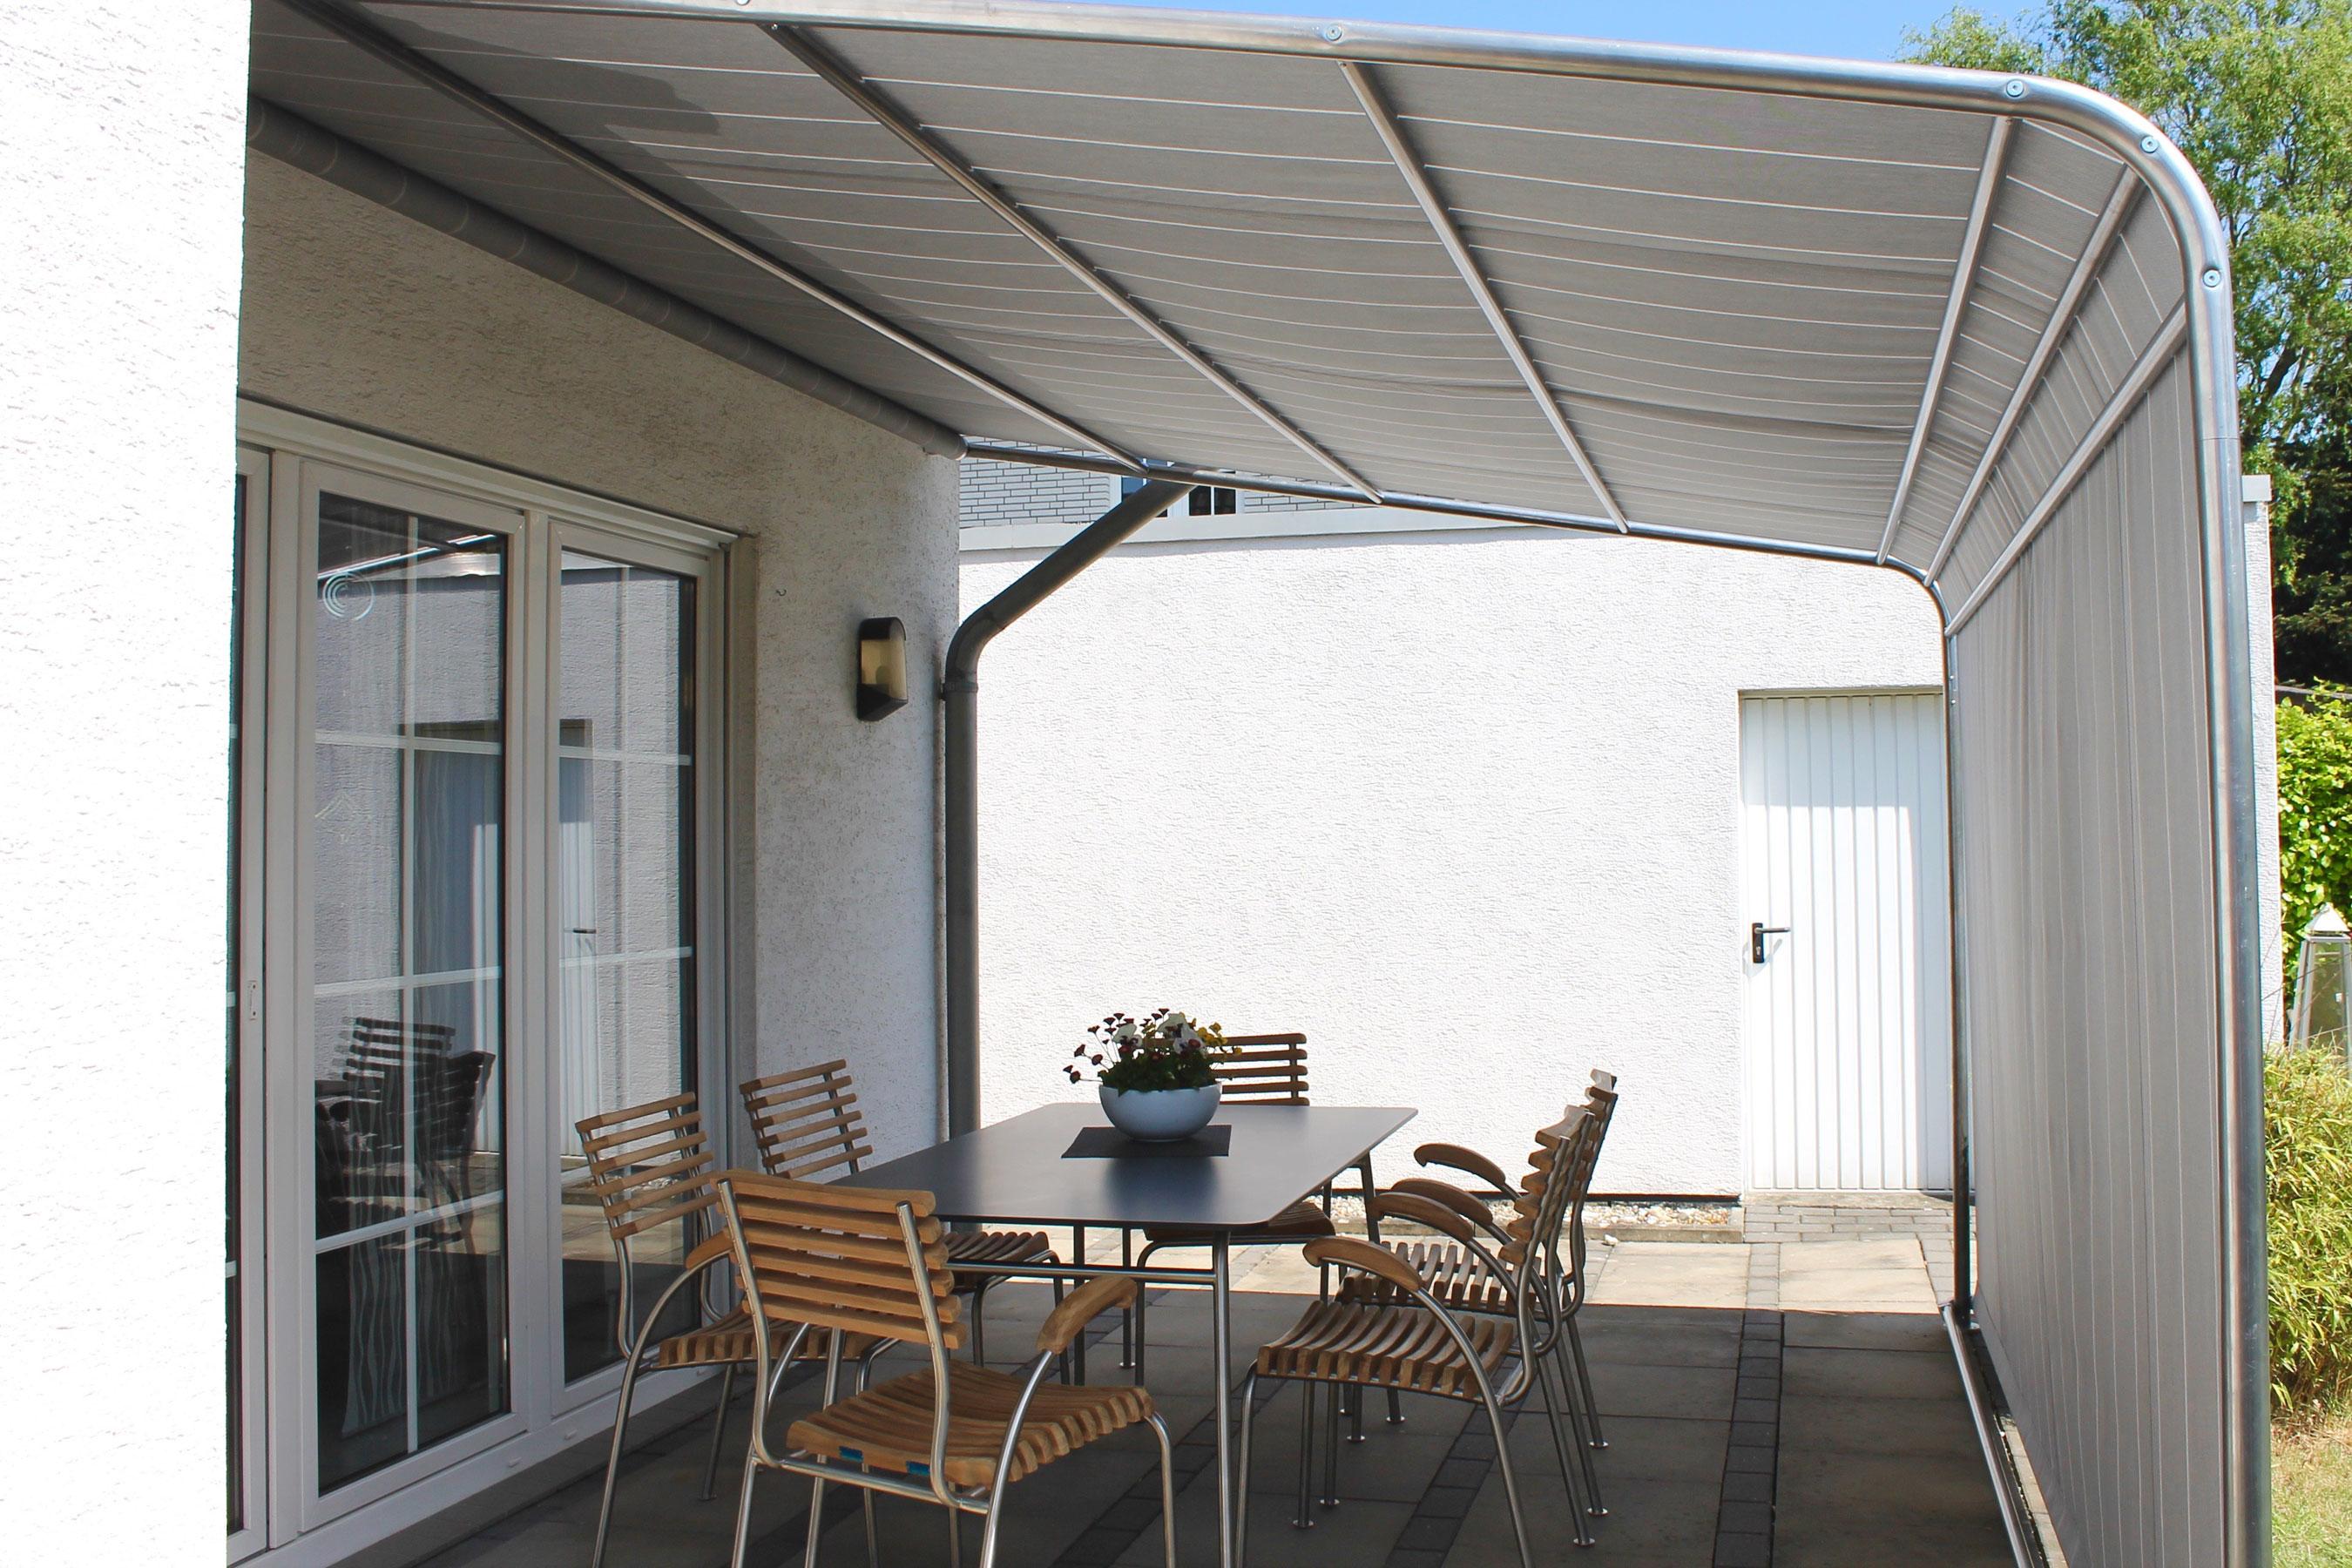 Sonnenschutz Terrassenuberdachung Gunstig ~ Leco sonnenschutz terrassenüberdachung komfort anthrazit 300x400cm